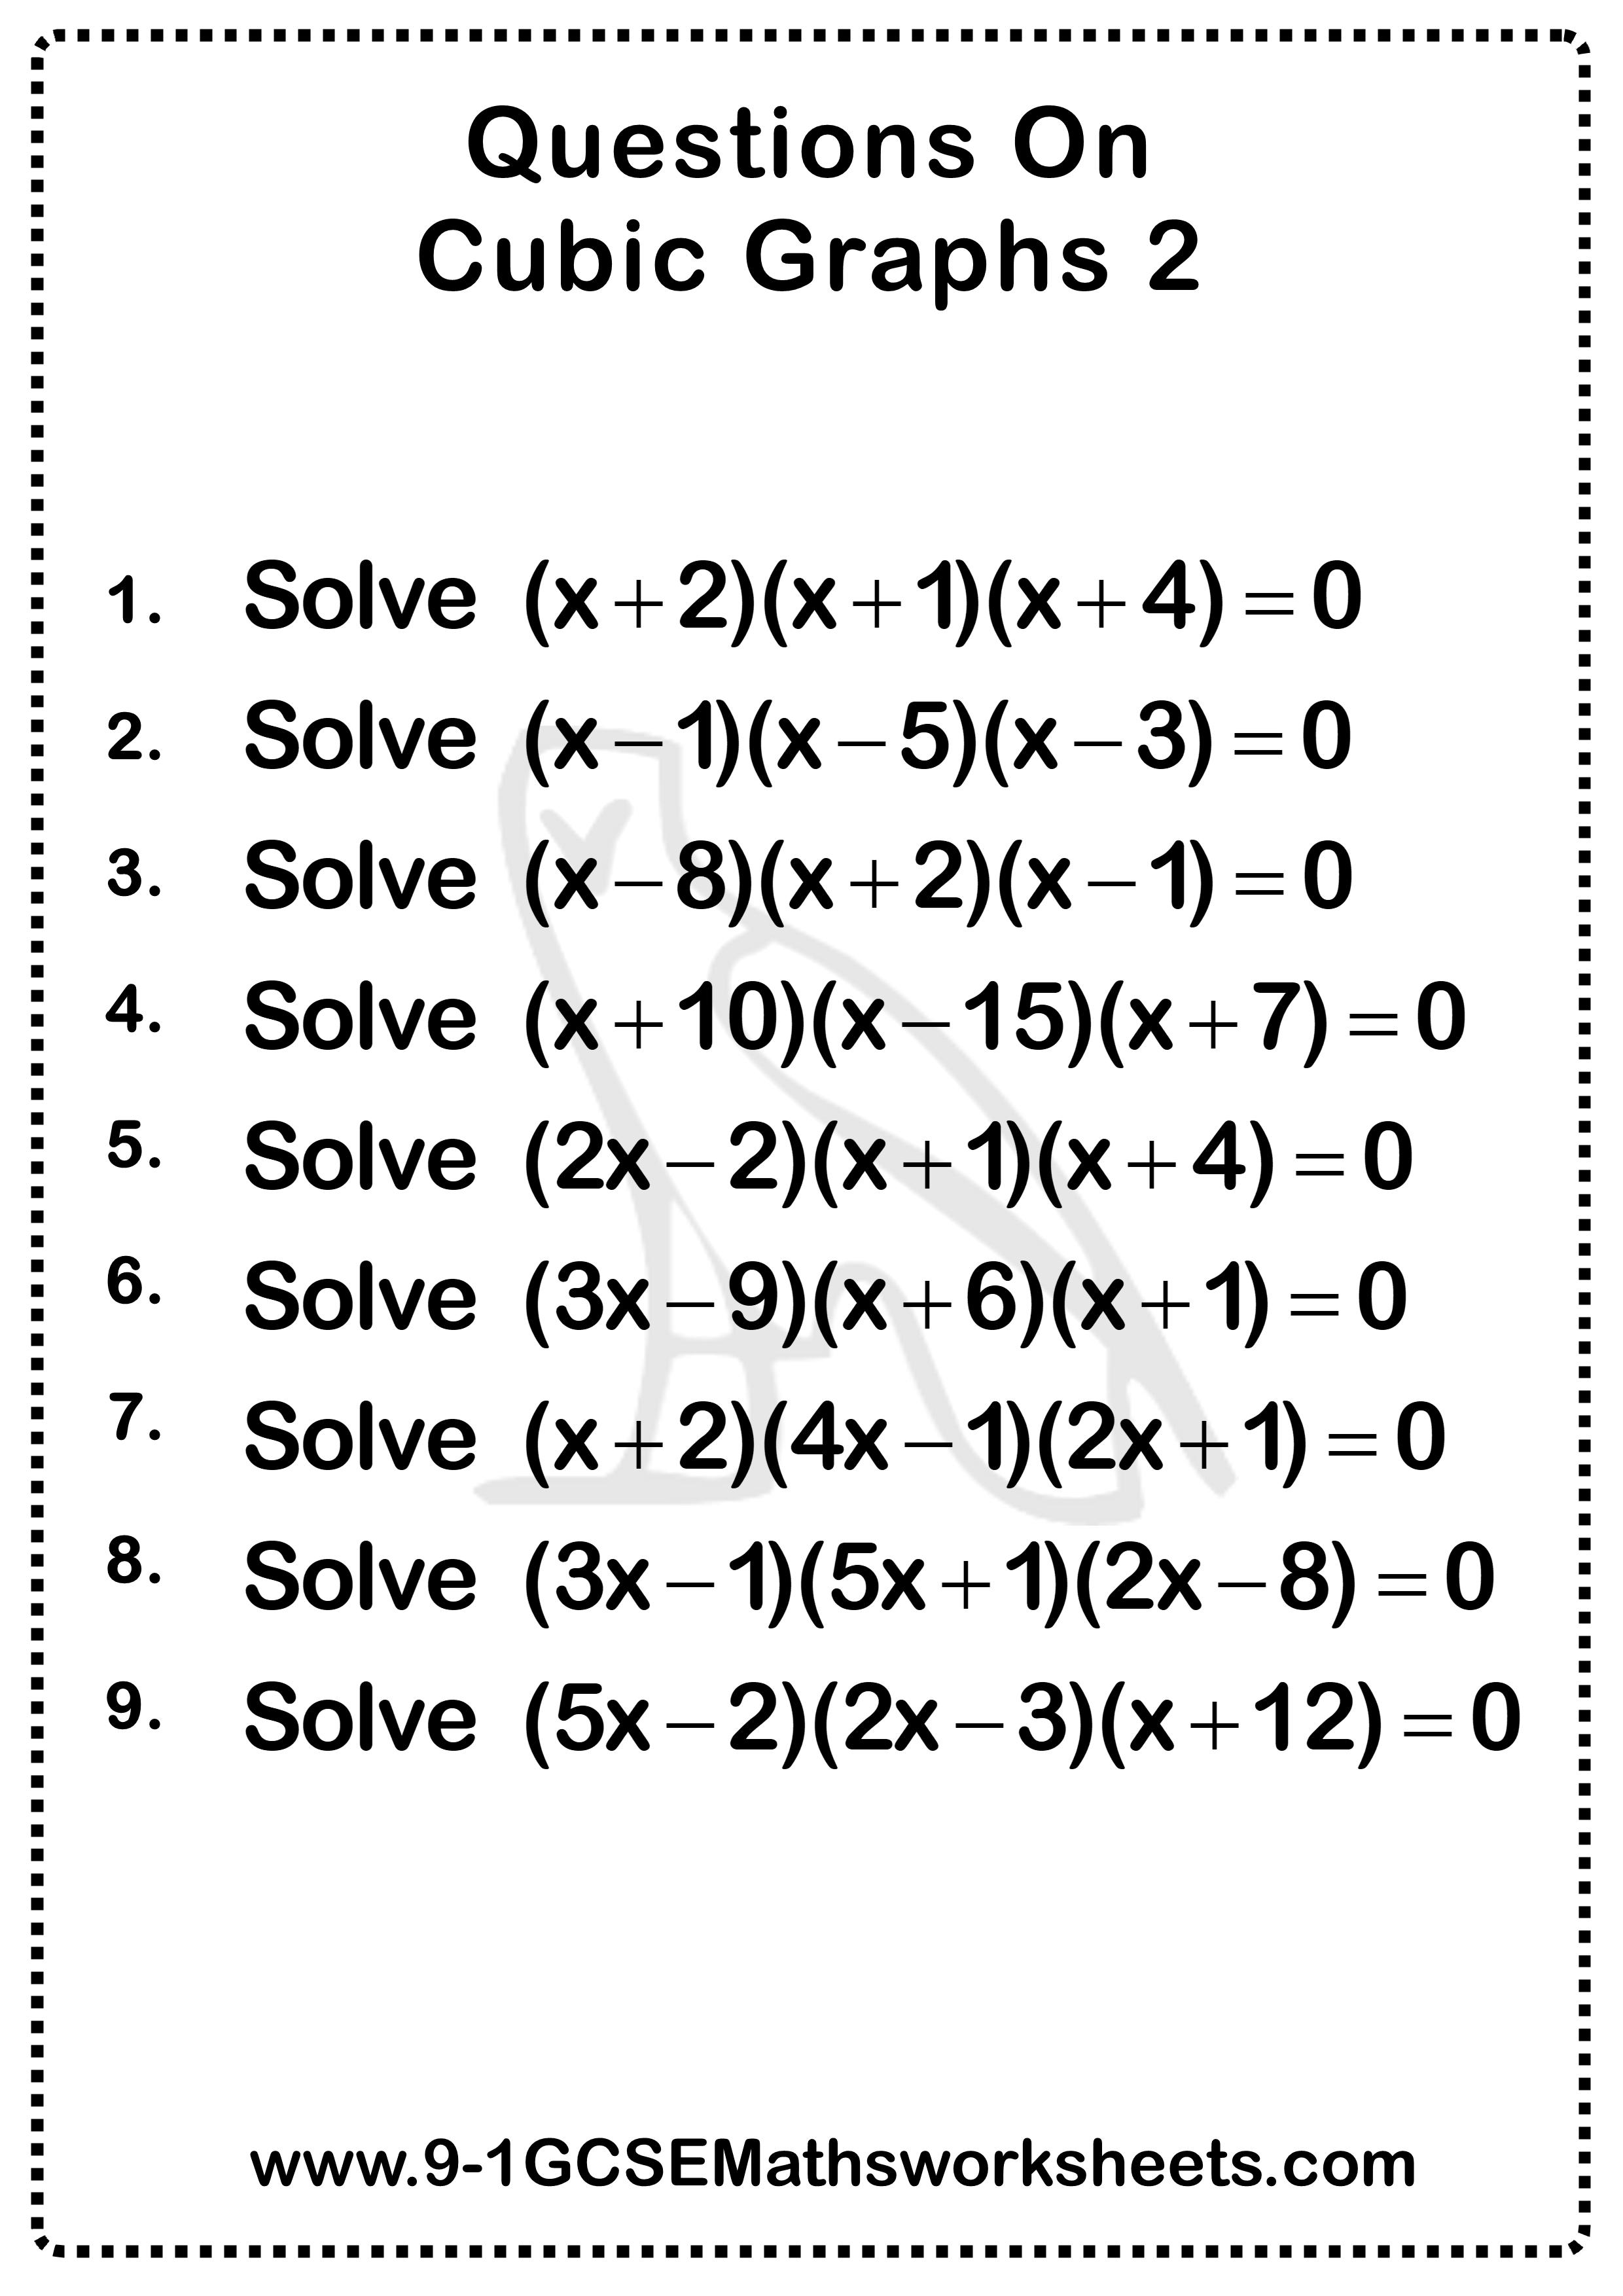 Cubic Graphs Worksheet 2